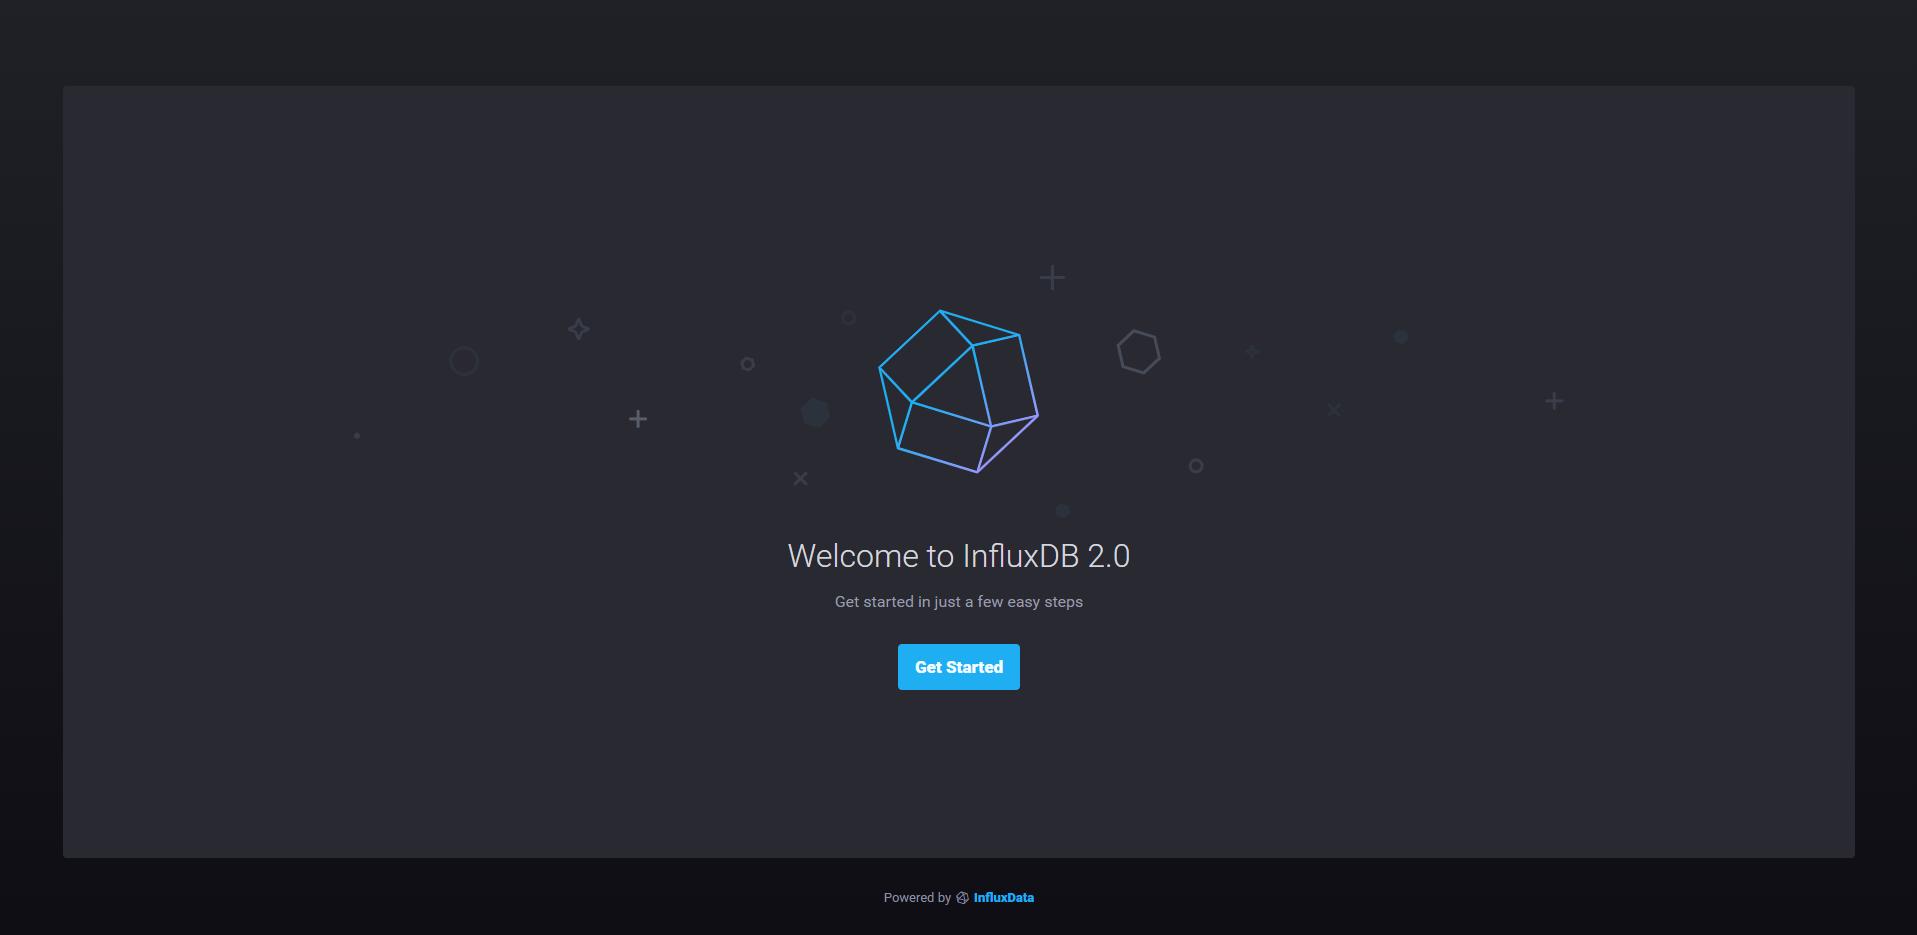 InfluxDB 2.0 setup screen